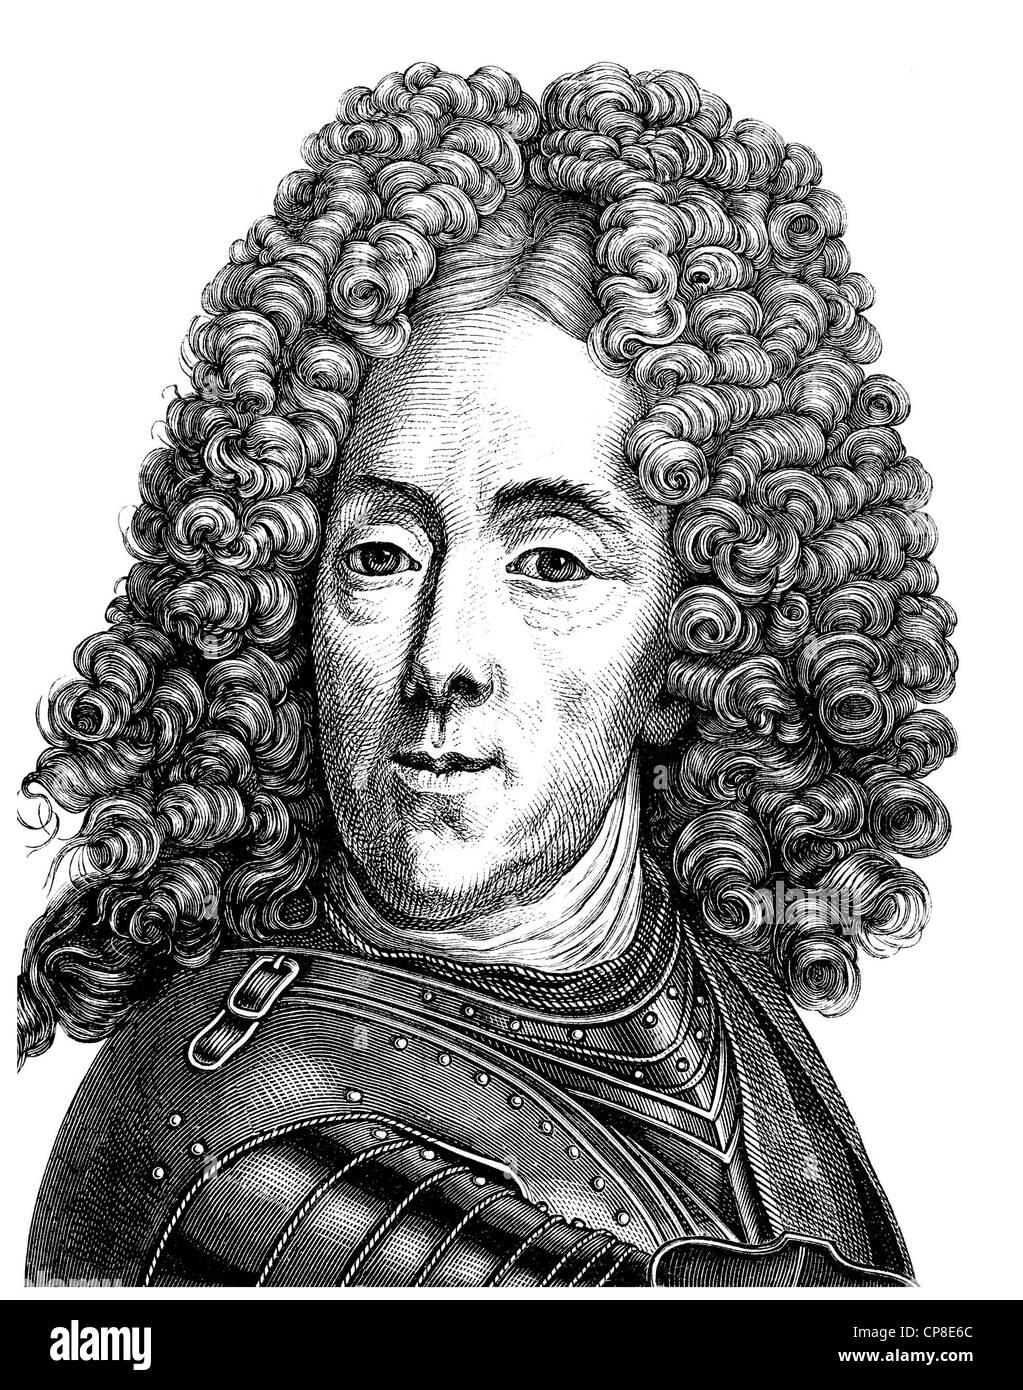 Eugene Francis, Prince of Savoy-Carignan or François-Eugène de Savoie-Carignan or Eugenio di Savoia-Carignano, - Stock Image